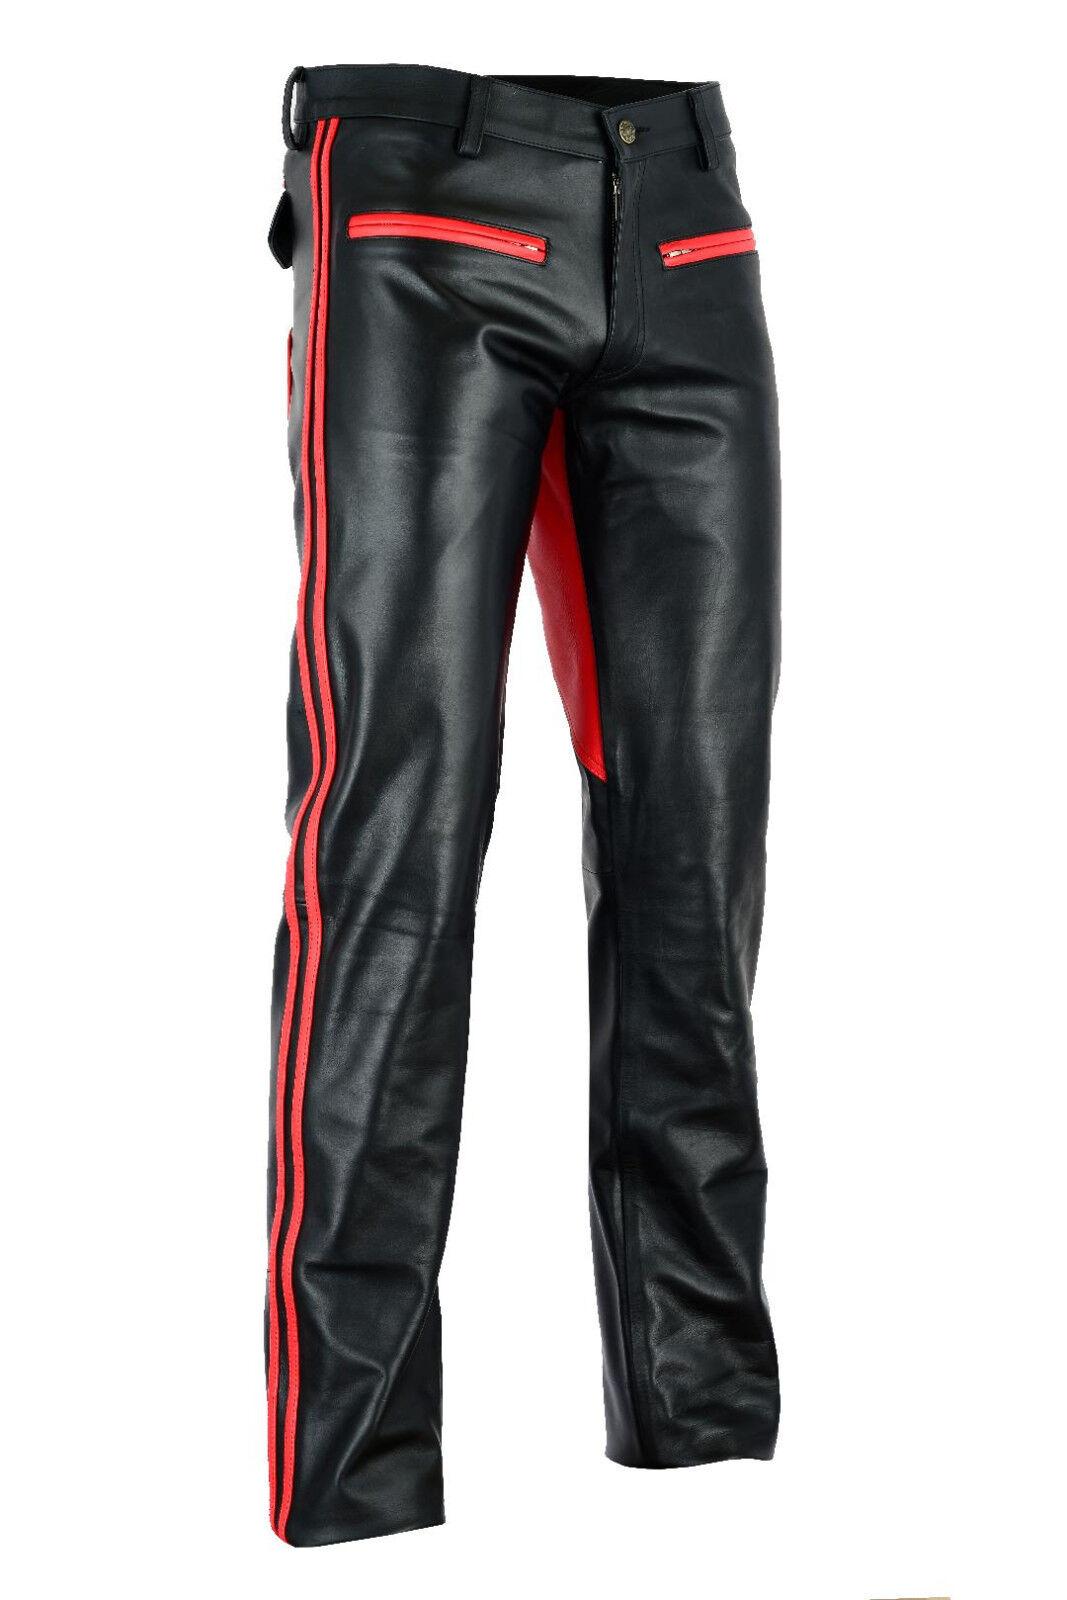 722 Echt Leder hose mit Rotem besatz besatz besatz Sattel,Reithose,Lederhose,pantalon Gr.32W | Zürich Online Shop  a0a78c